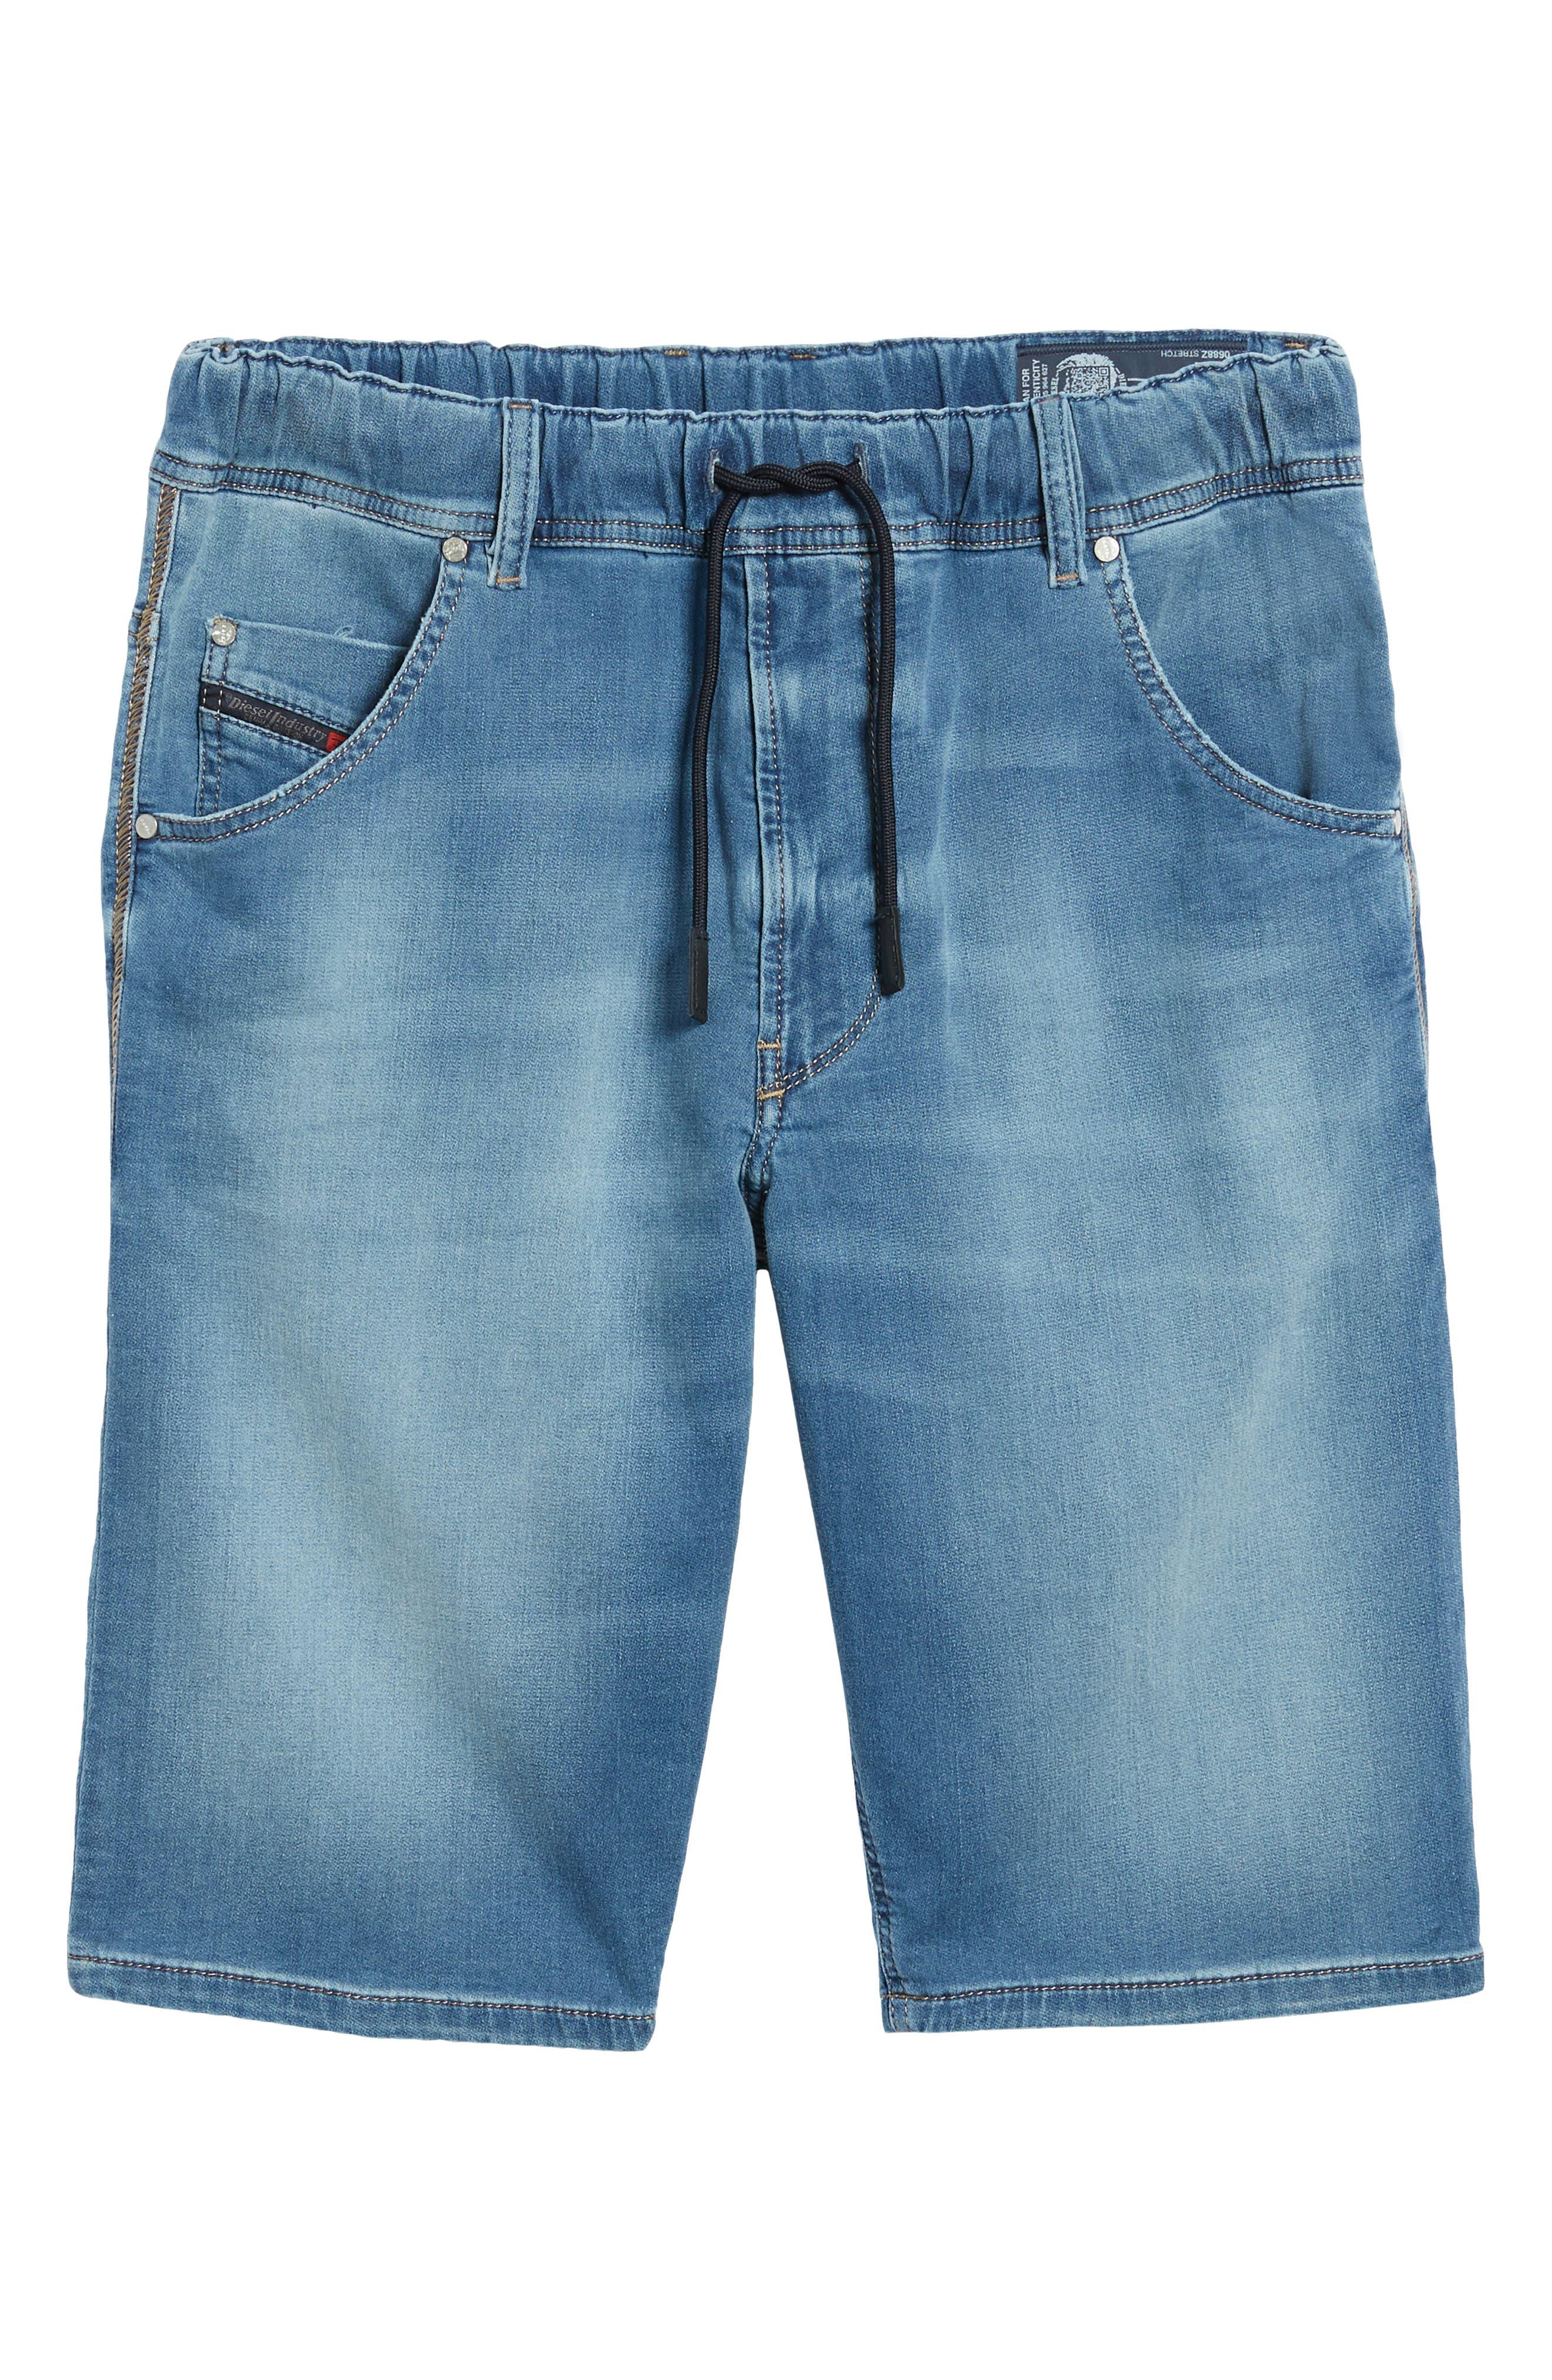 Krooshort Denim Shorts,                             Alternate thumbnail 6, color,                             Denim